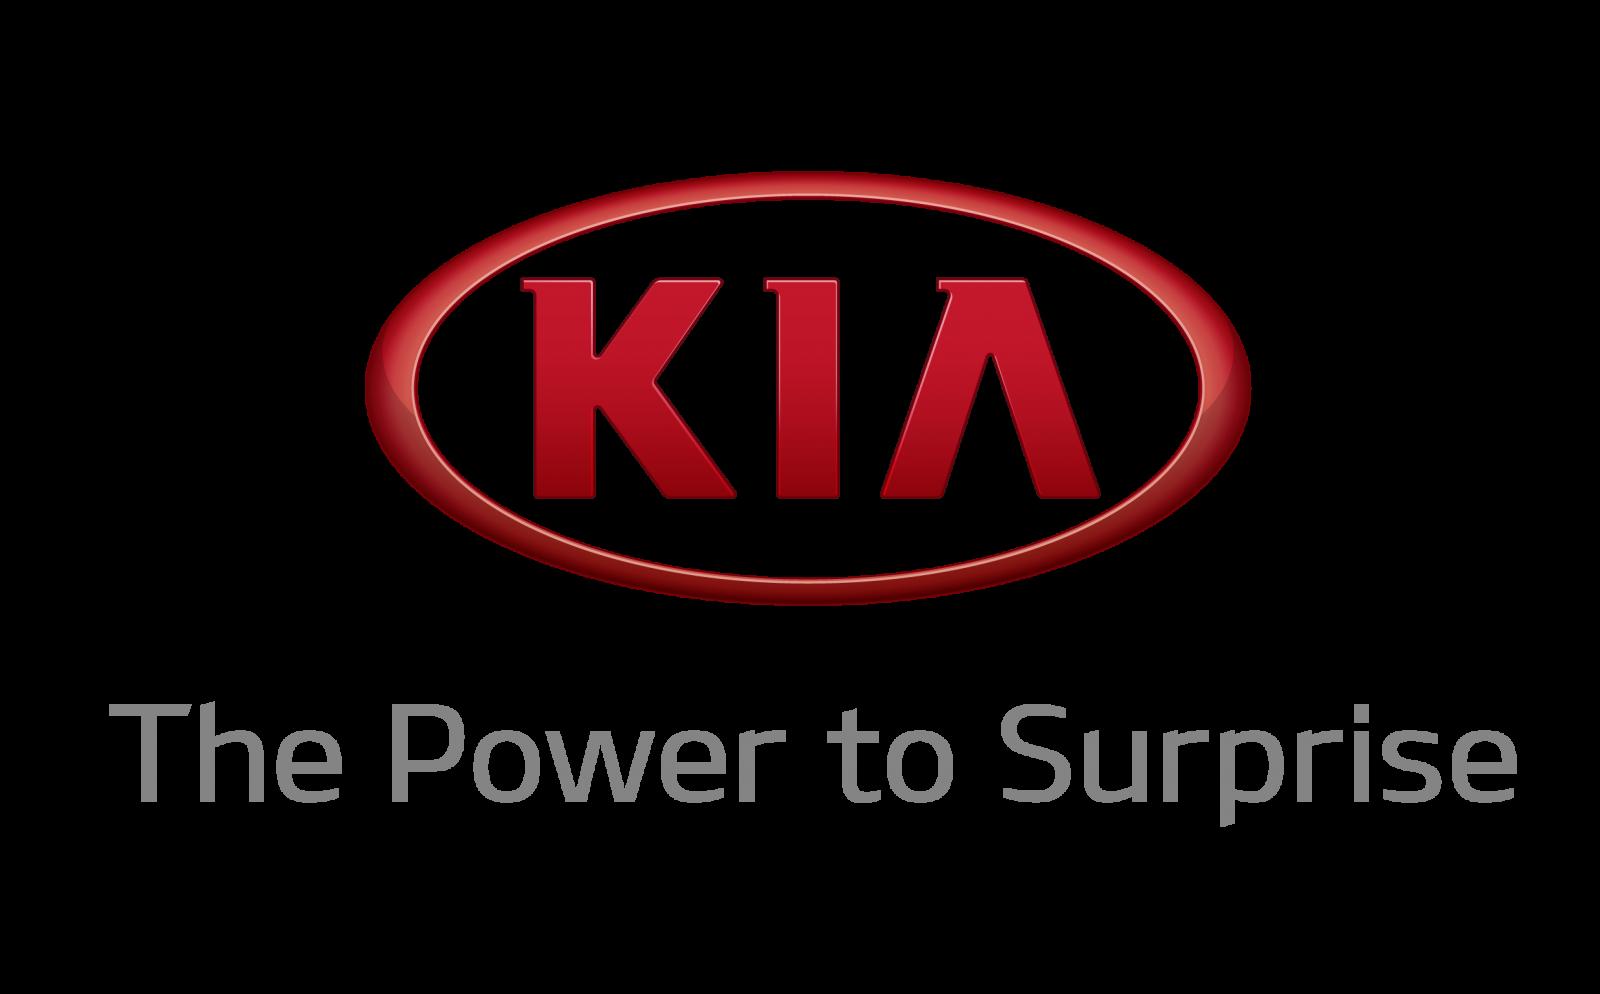 image kia power to surprise png logopedia fandom powered by wikia rh logos wikia com kia rio logo vector kia logo vector download